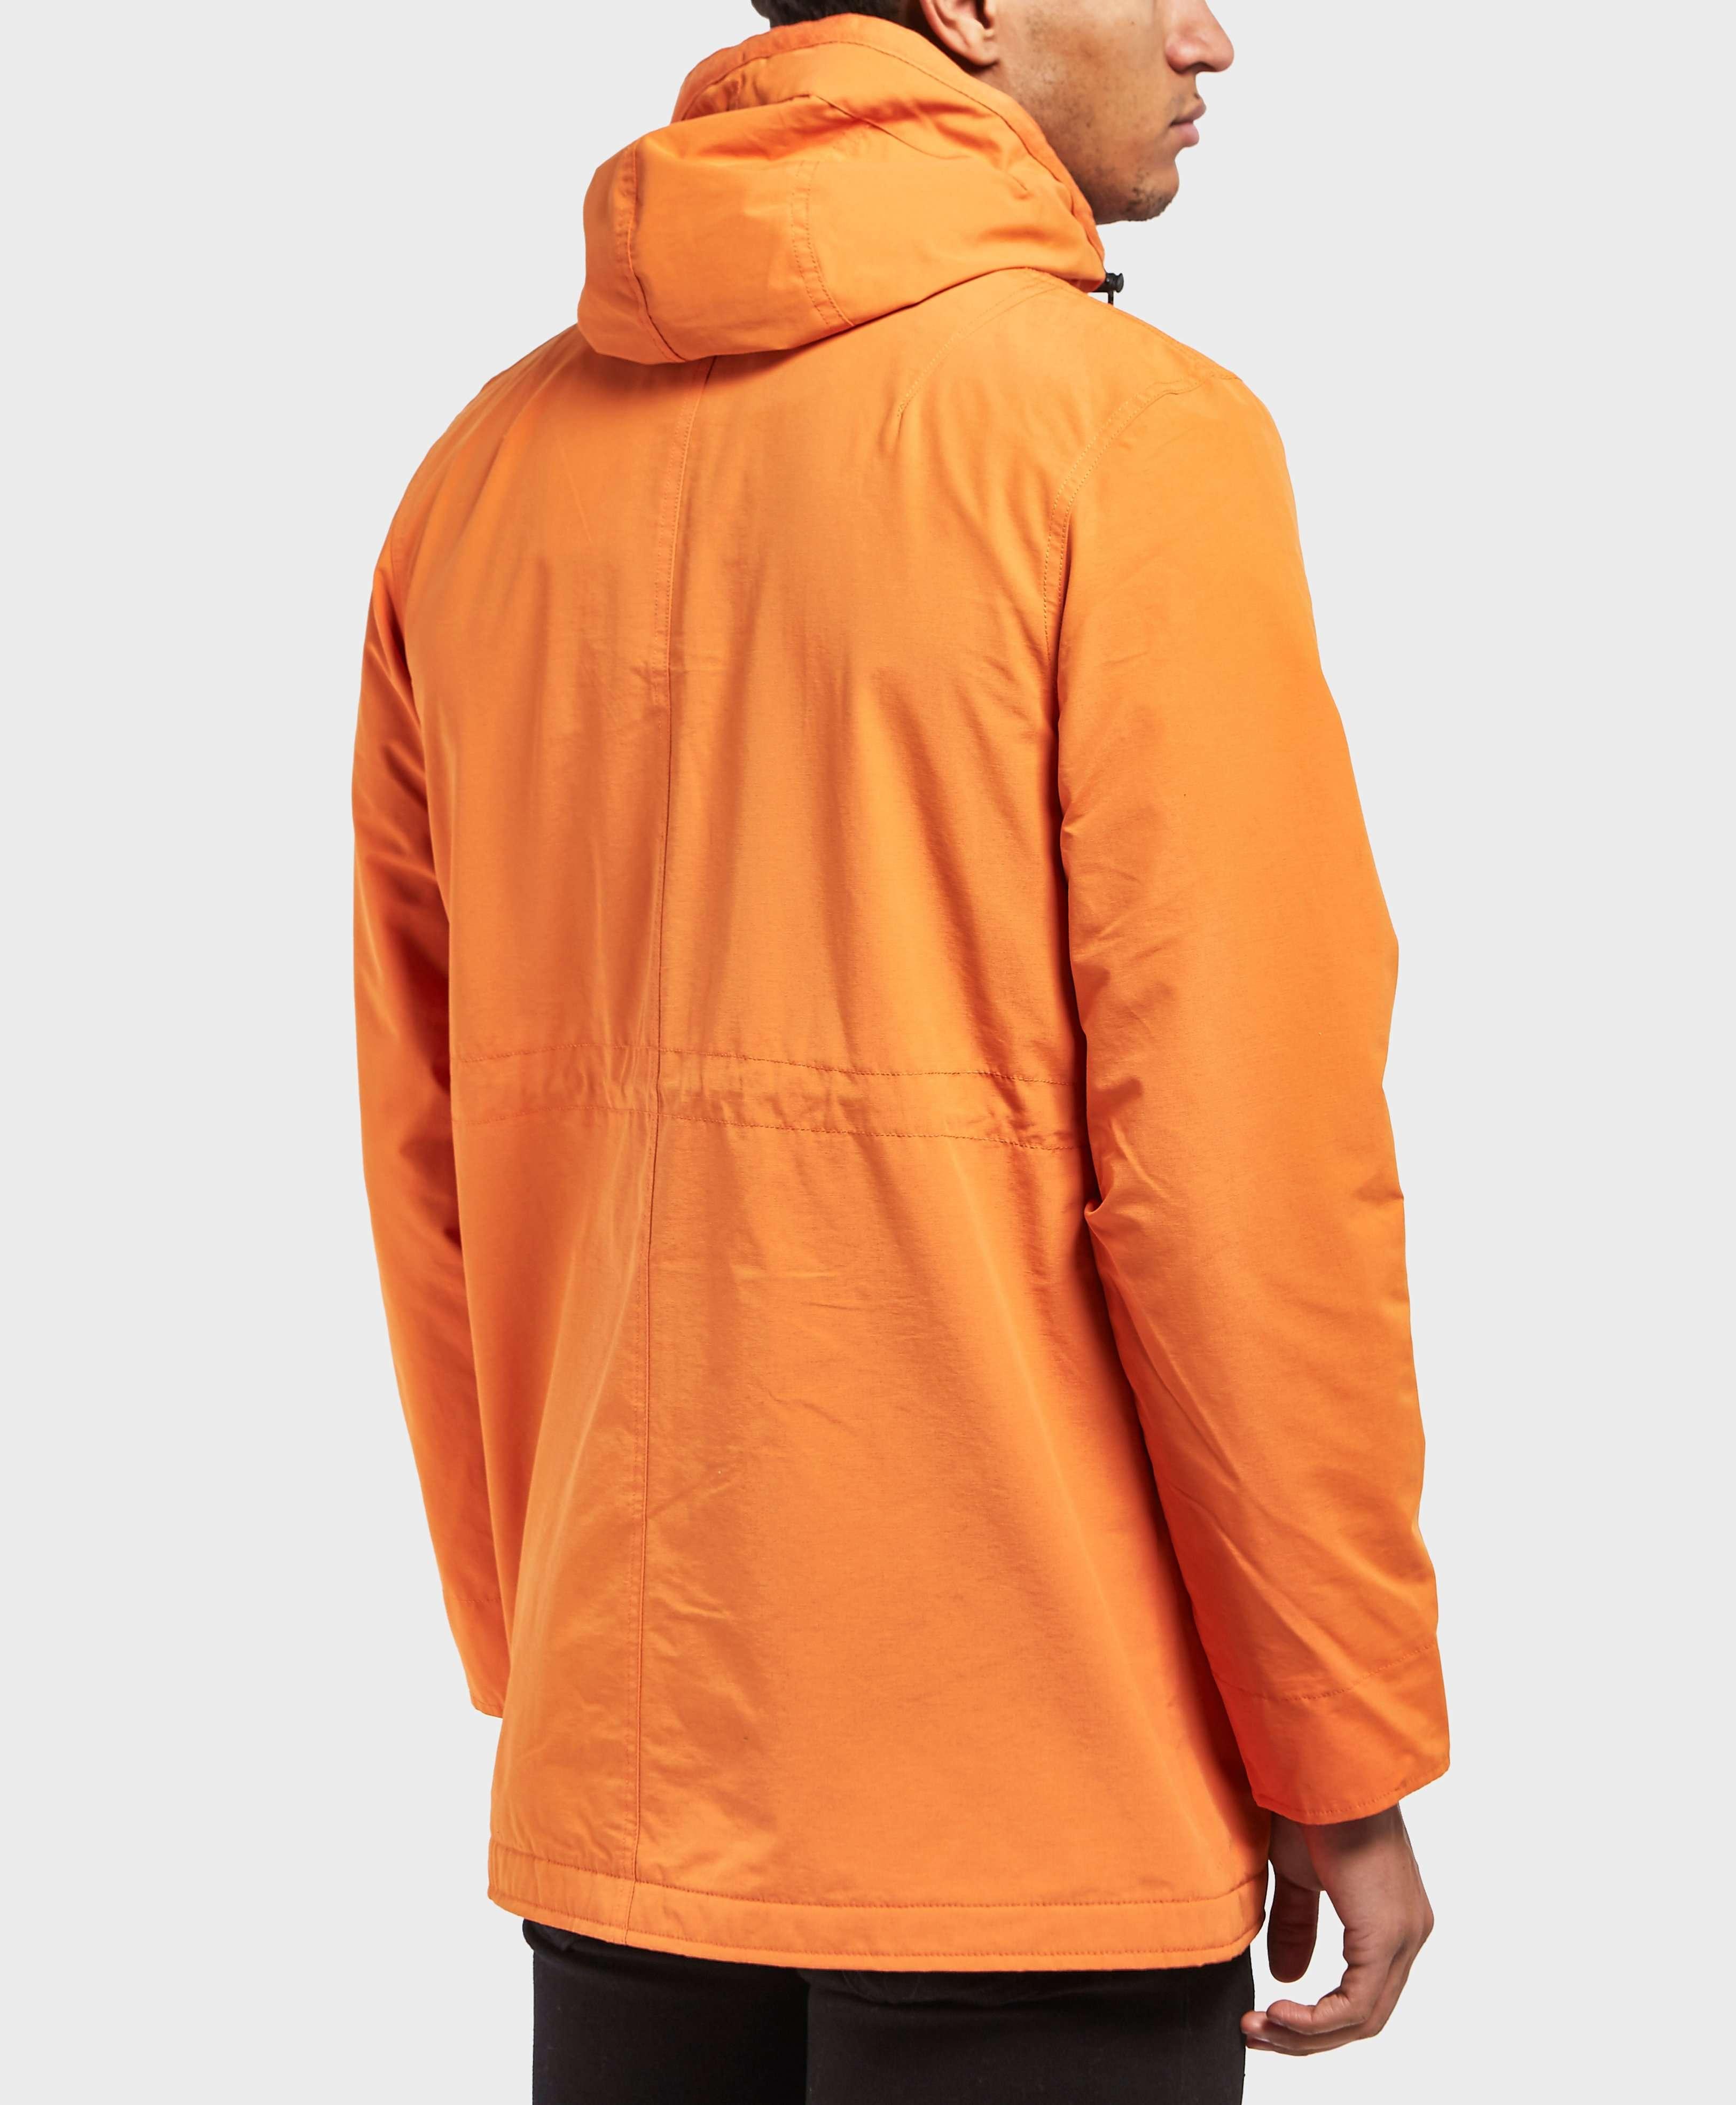 Lyle & Scott Microfleece Lightweight Jacket